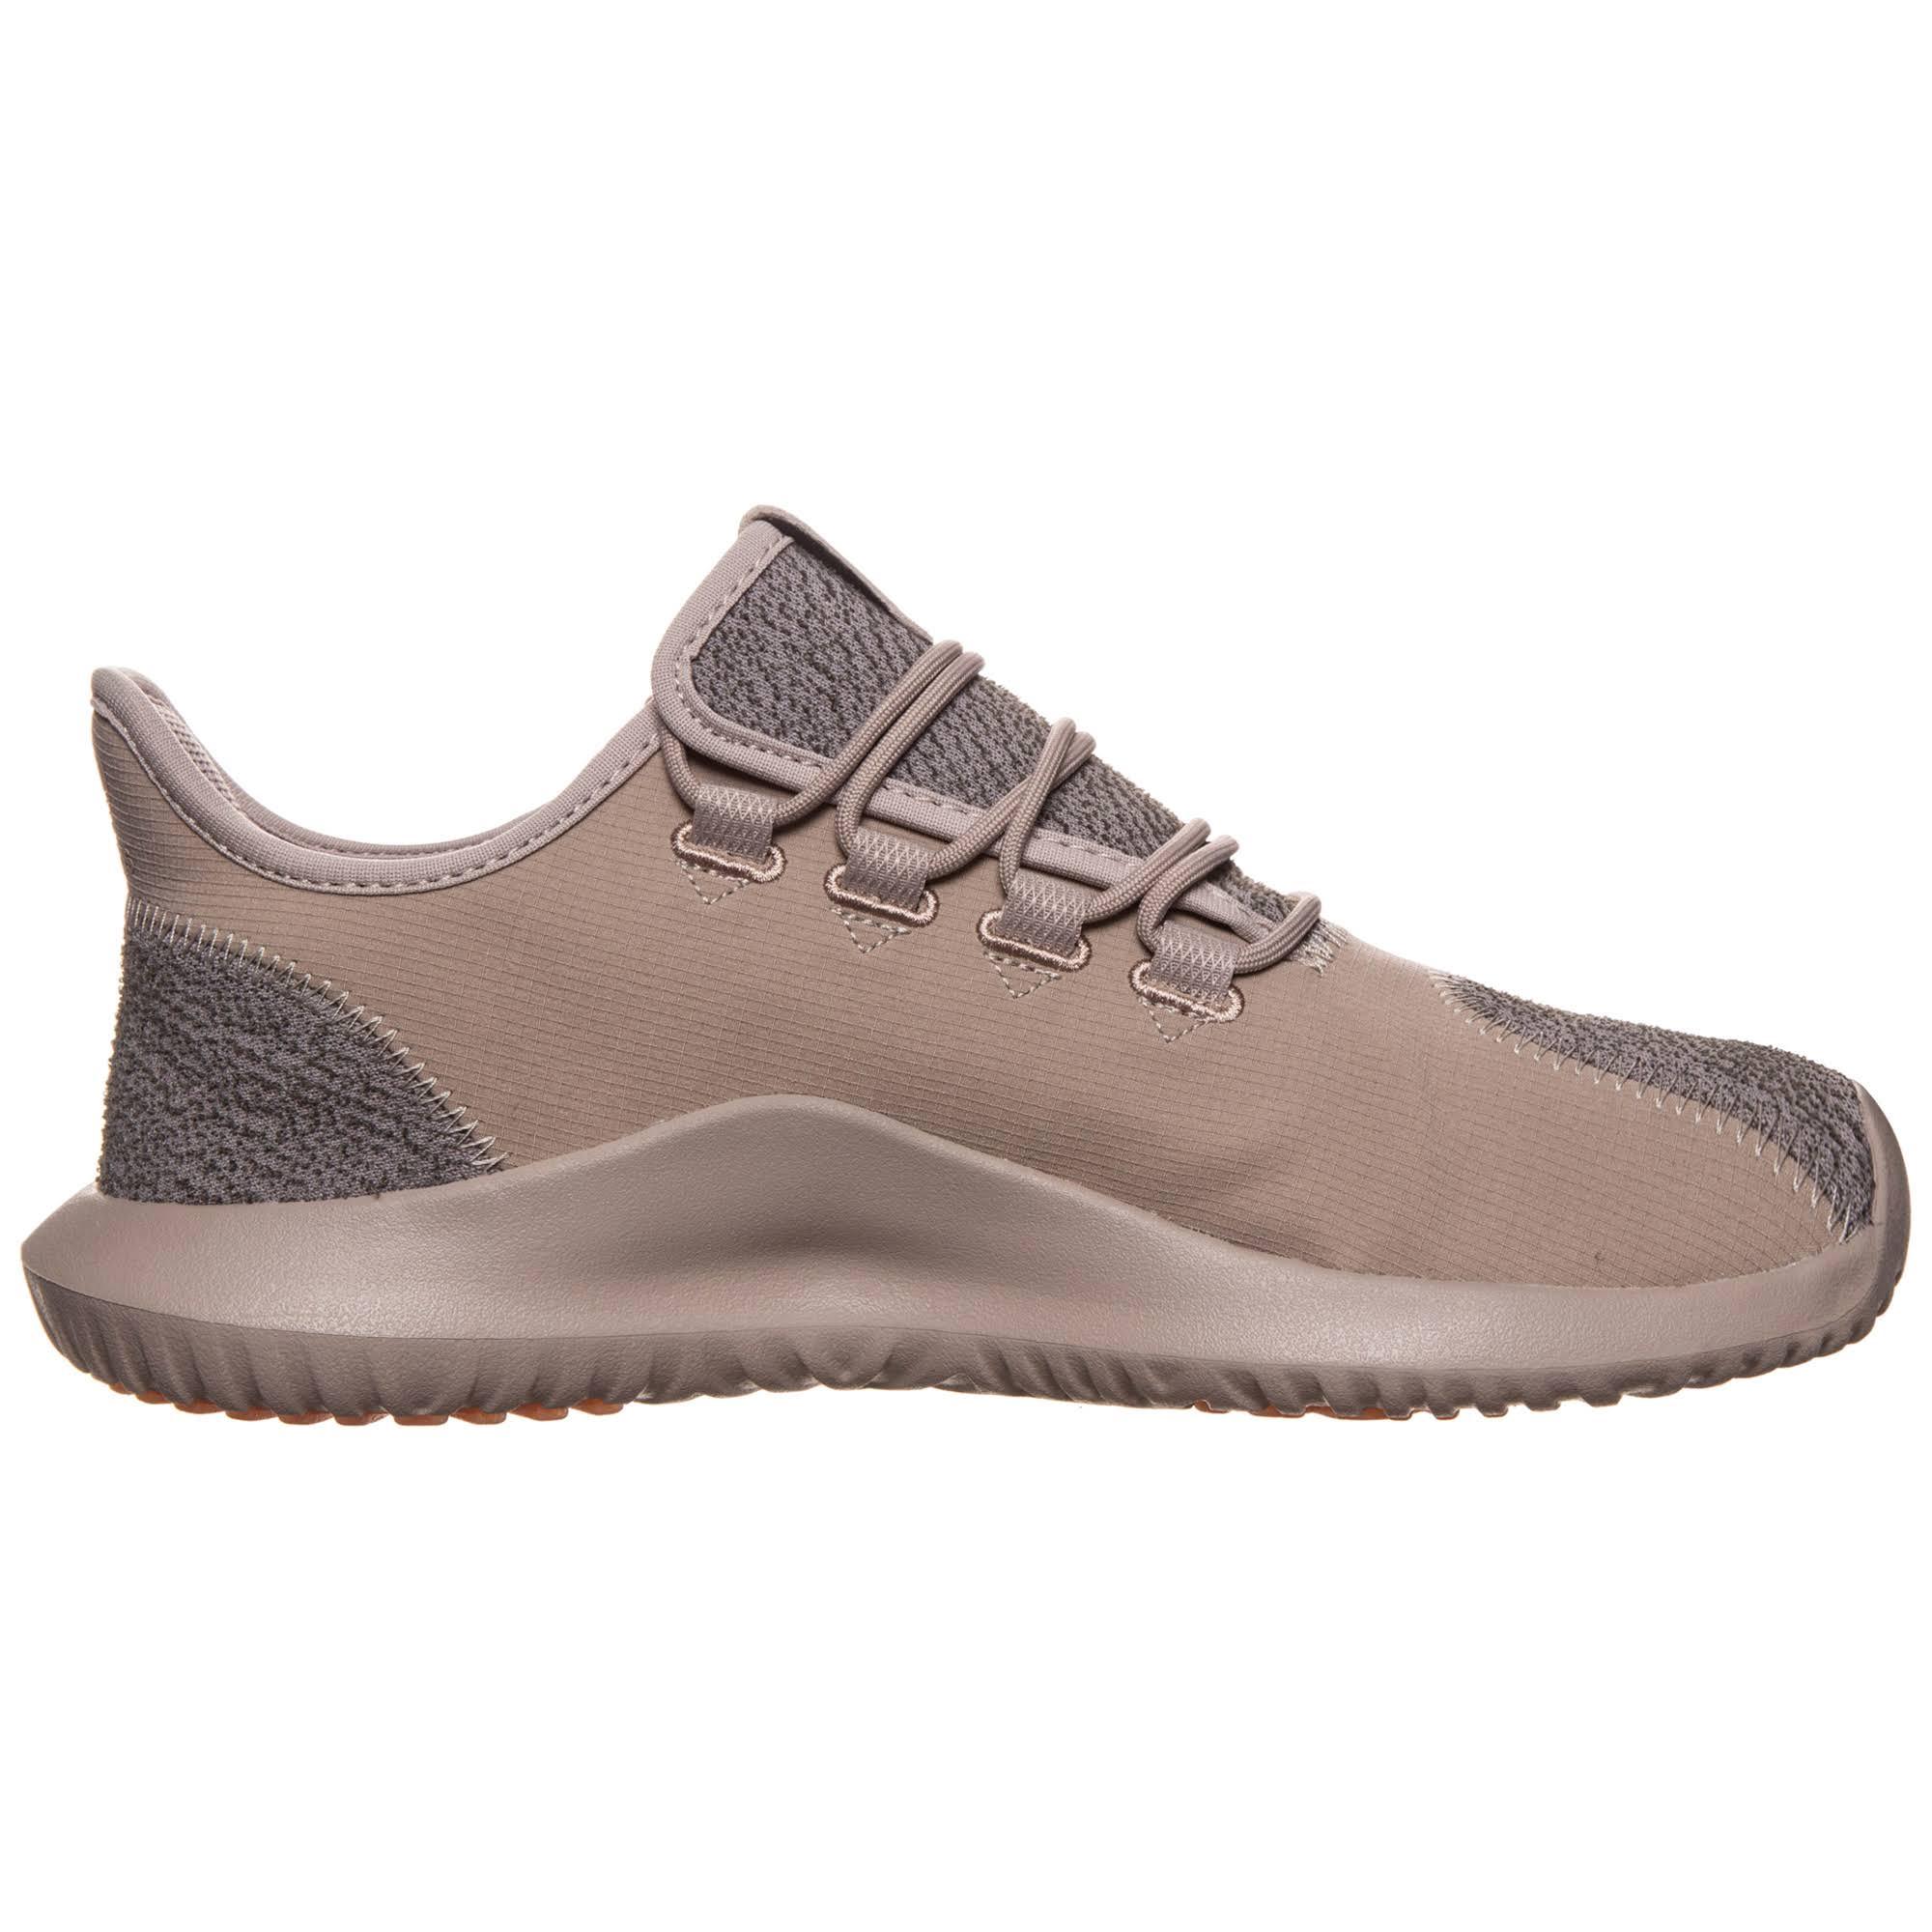 Shadow Adidas Tubular Lila Schuhe Grau Schuhgröße Eur Farbe Originals TTqv7